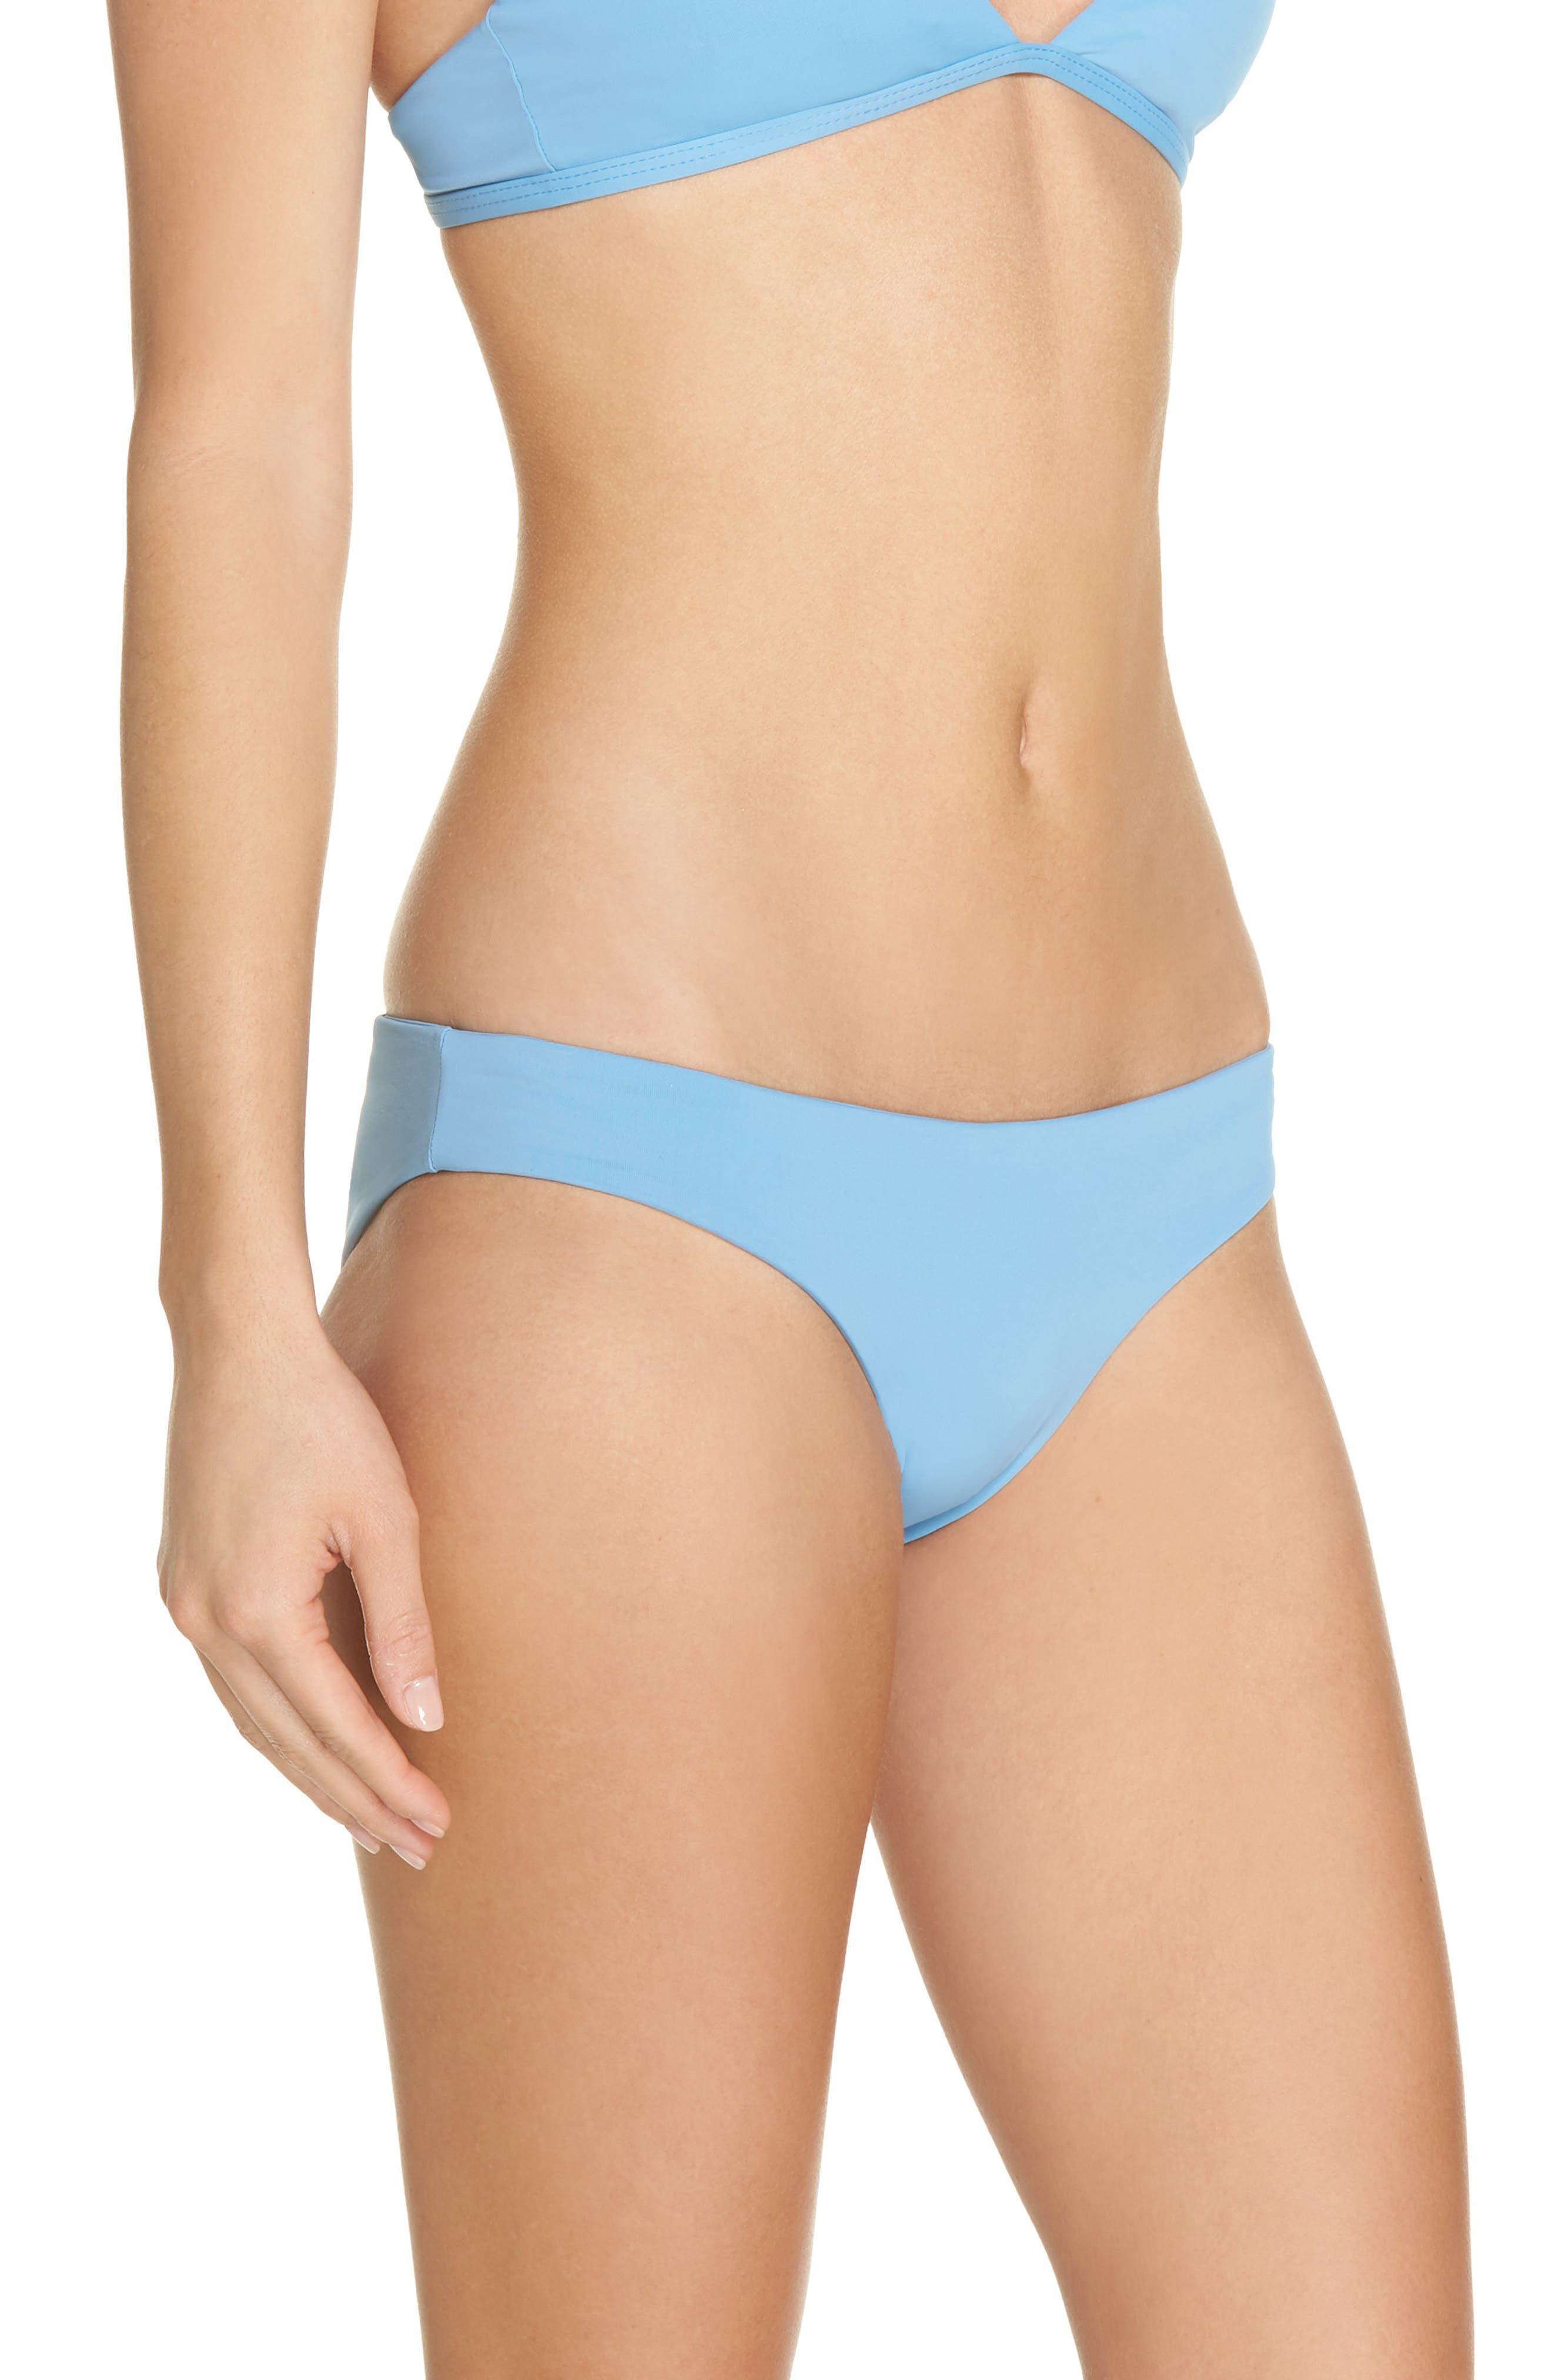 Sandy Classic Bikini Bottoms,                             Alternate thumbnail 3, color,                             Ocean